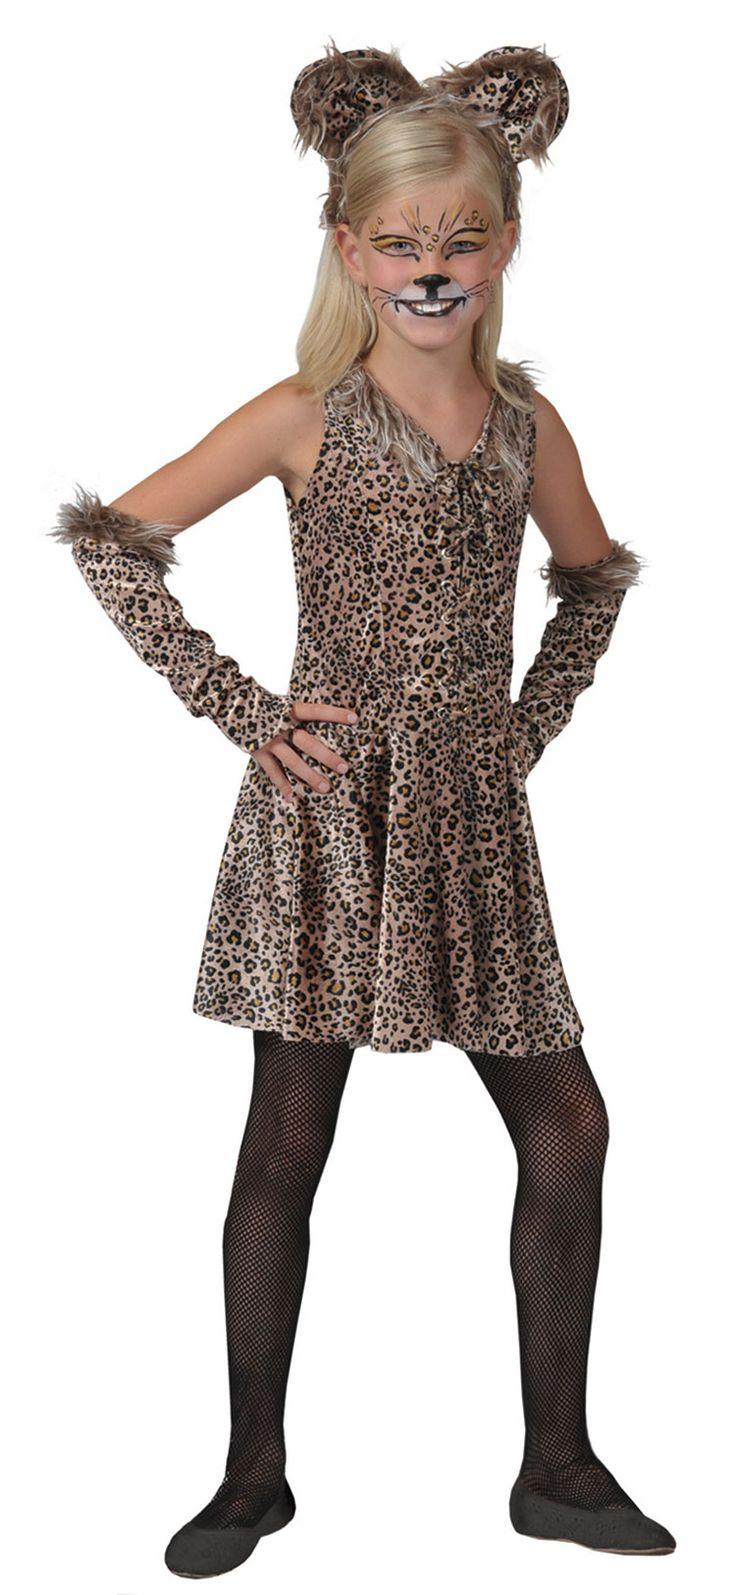 Best 25+ Leopard costume ideas on Pinterest | Leopard makeup, Cat ...